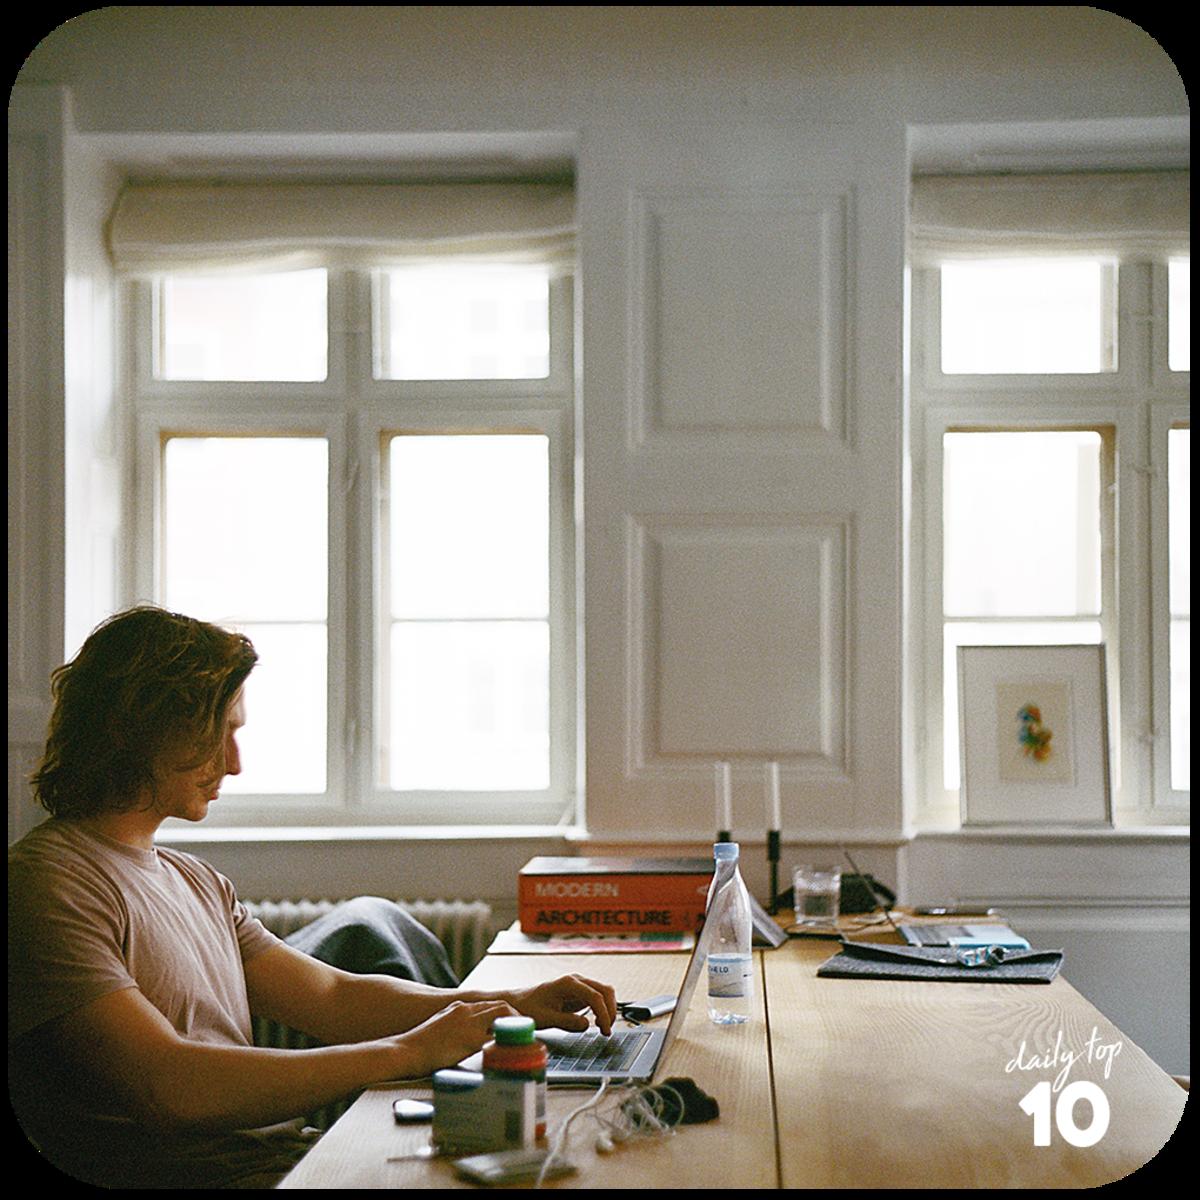 top-10-best-dating-tips-for-men